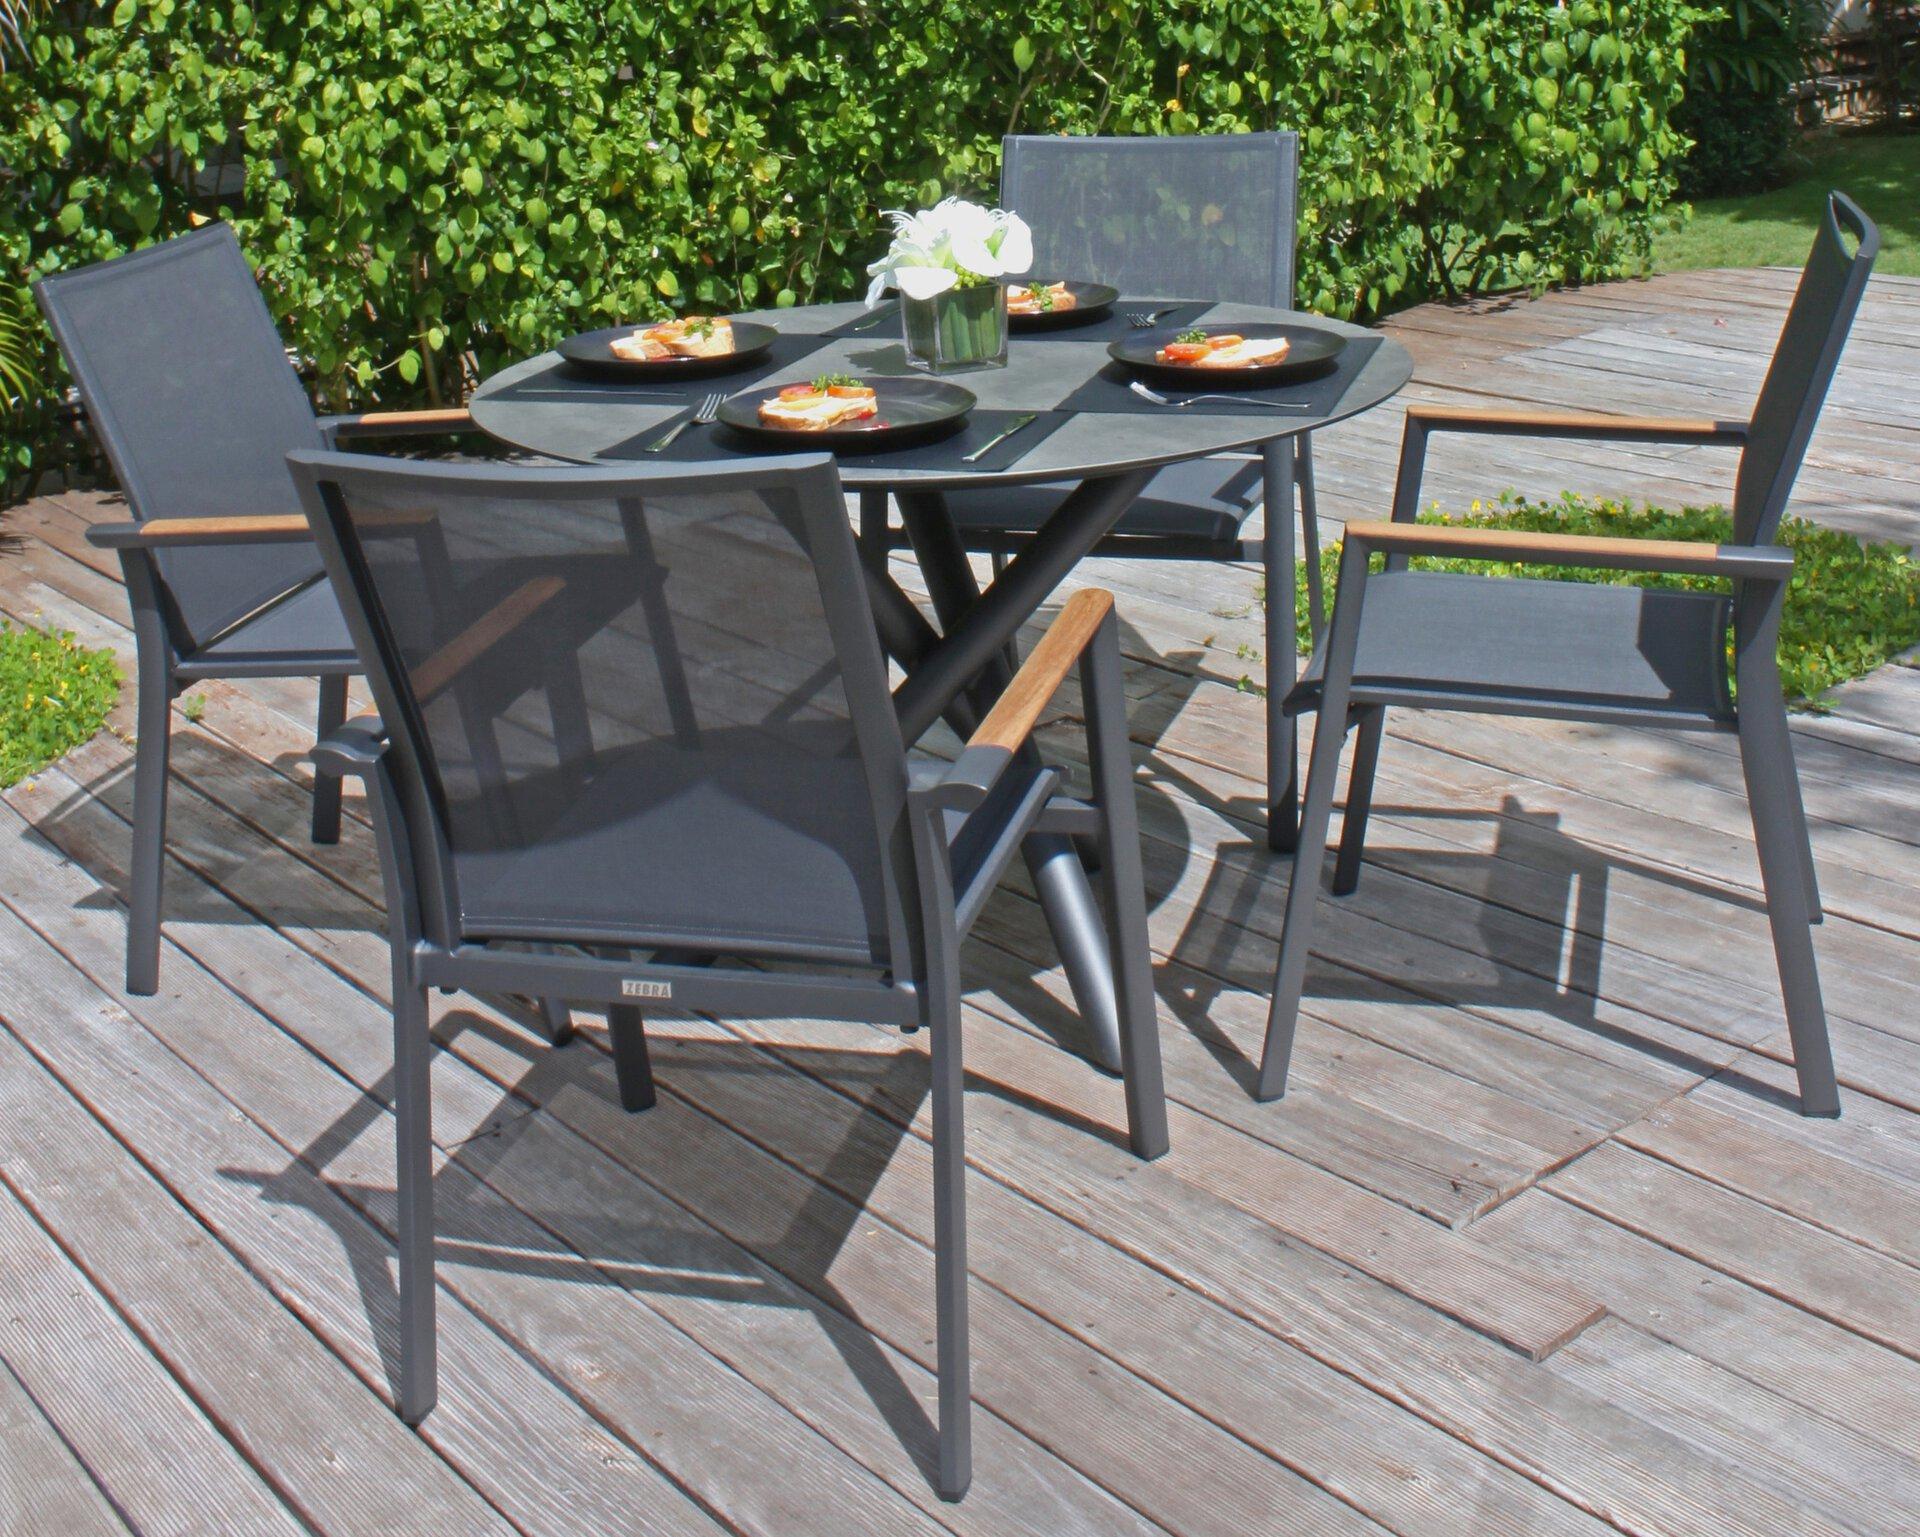 Stapelstuhl FLY Zebra-Süd Textil grau 62 x 91 x 69 cm